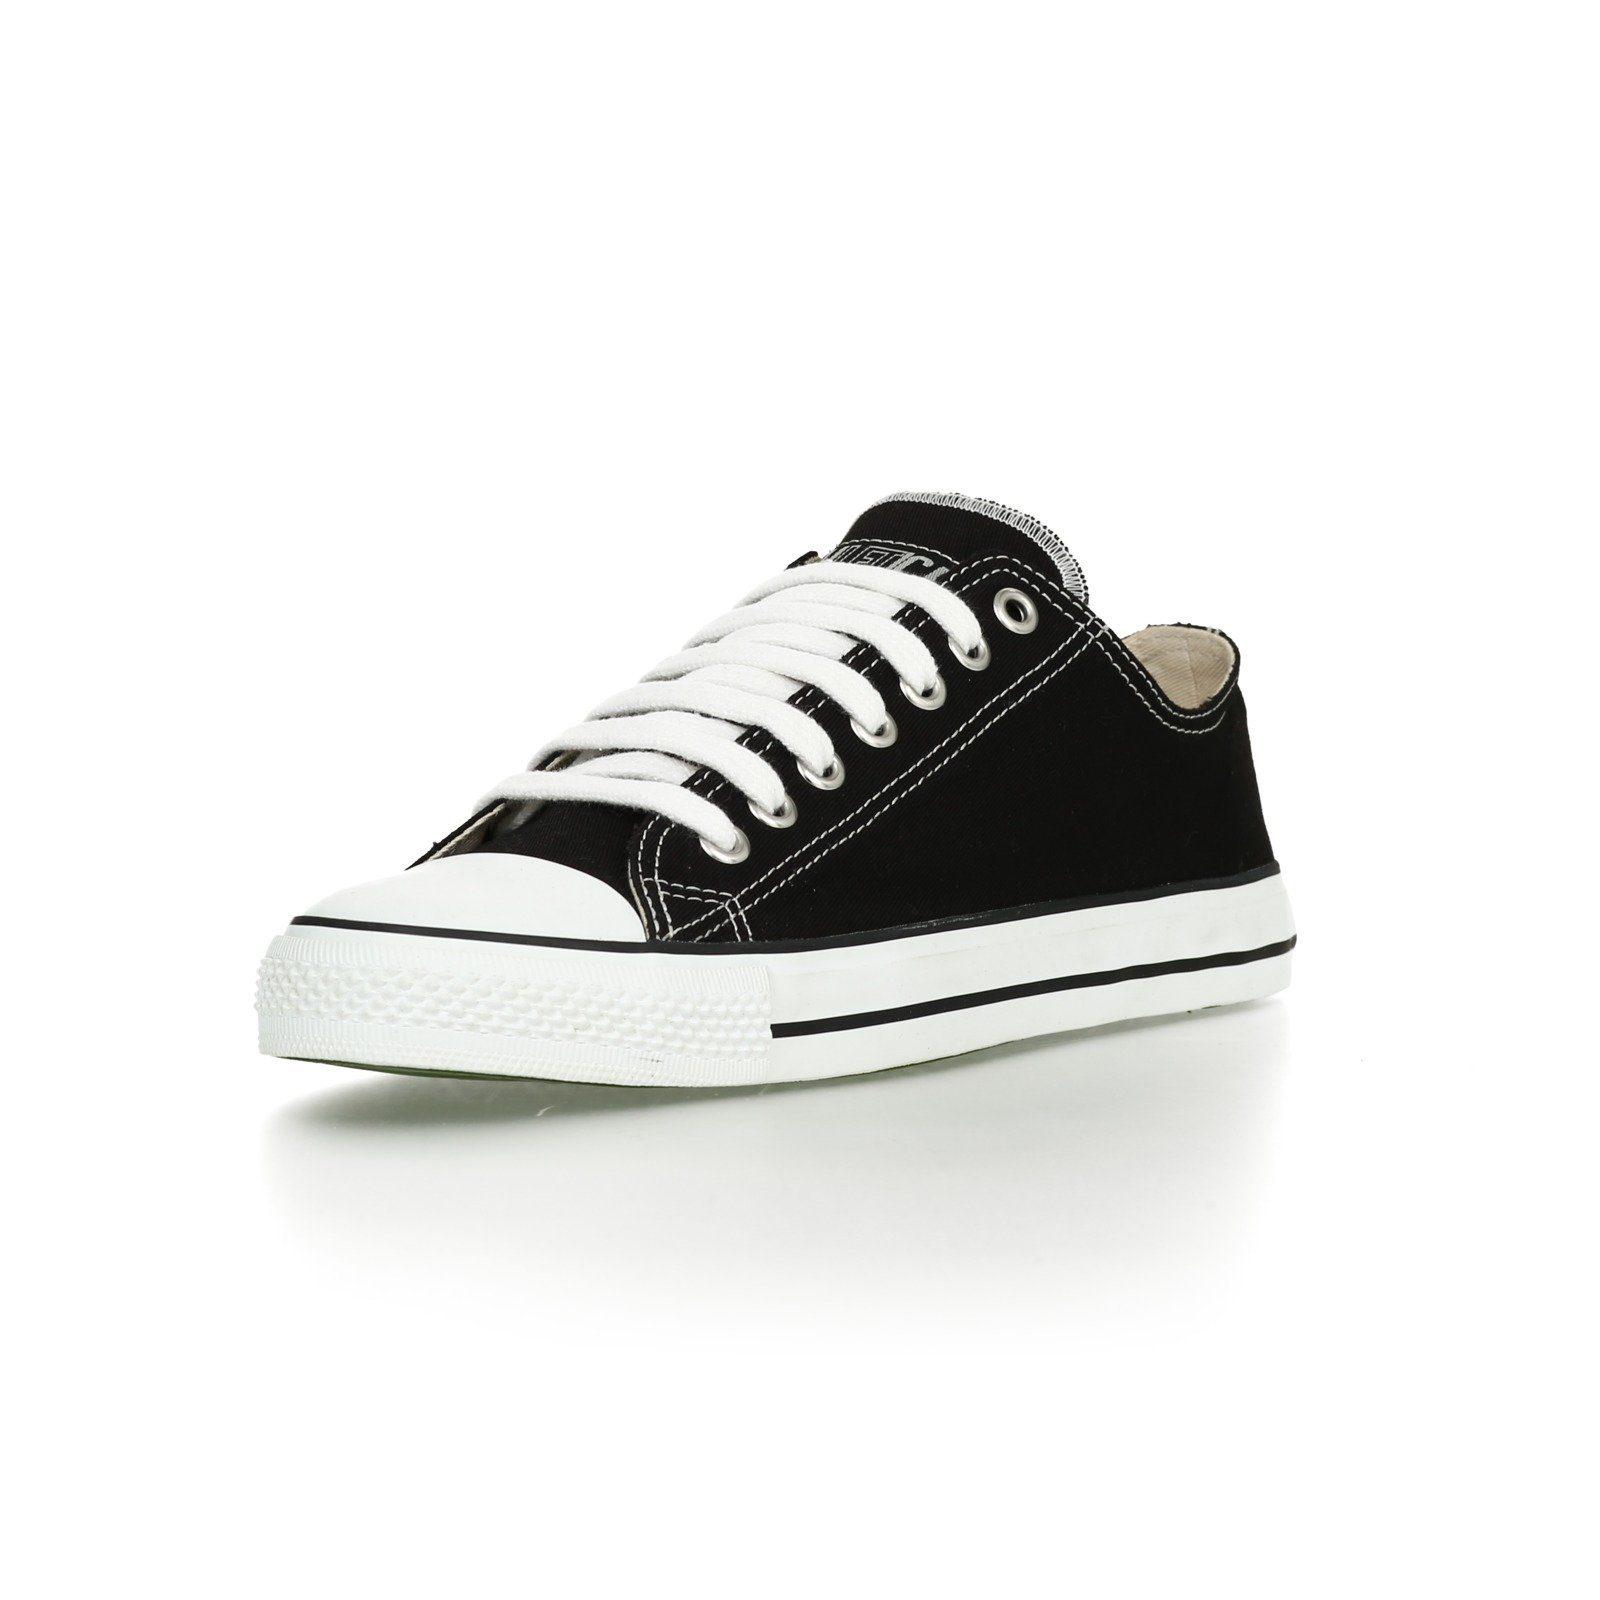 ETHLETIC Sneaker aus nachhaltiger Produktion White Cap Lo Cut Classic online kaufen  Jet Black | Just White